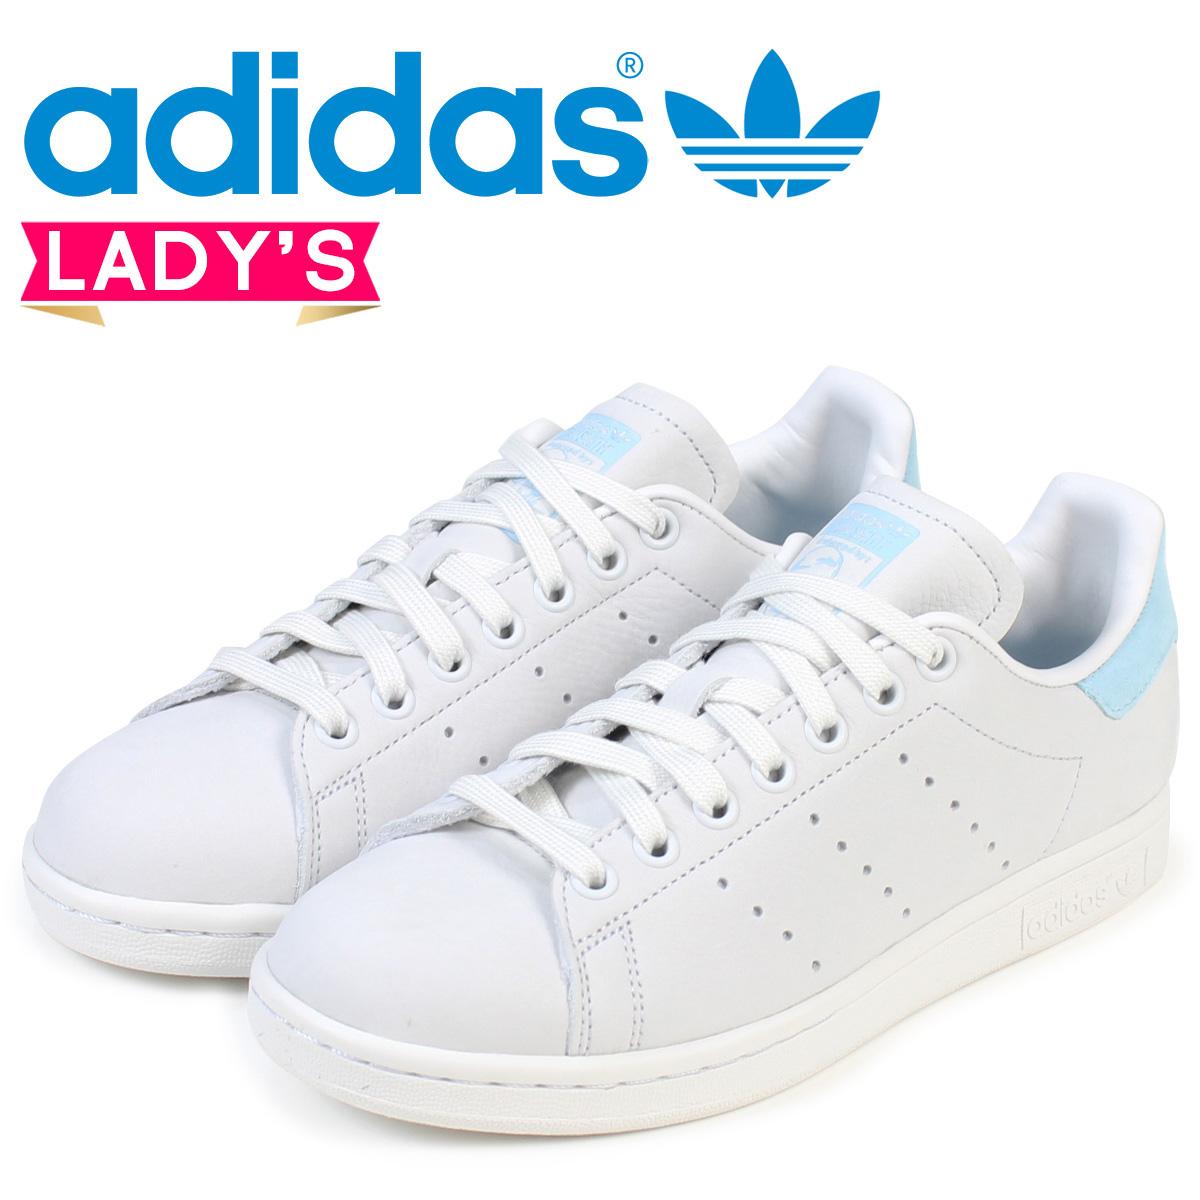 adidas Originals スタンスミス レディース アディダス スニーカー STAN SMITH W BZ0390 靴 ホワイト 白